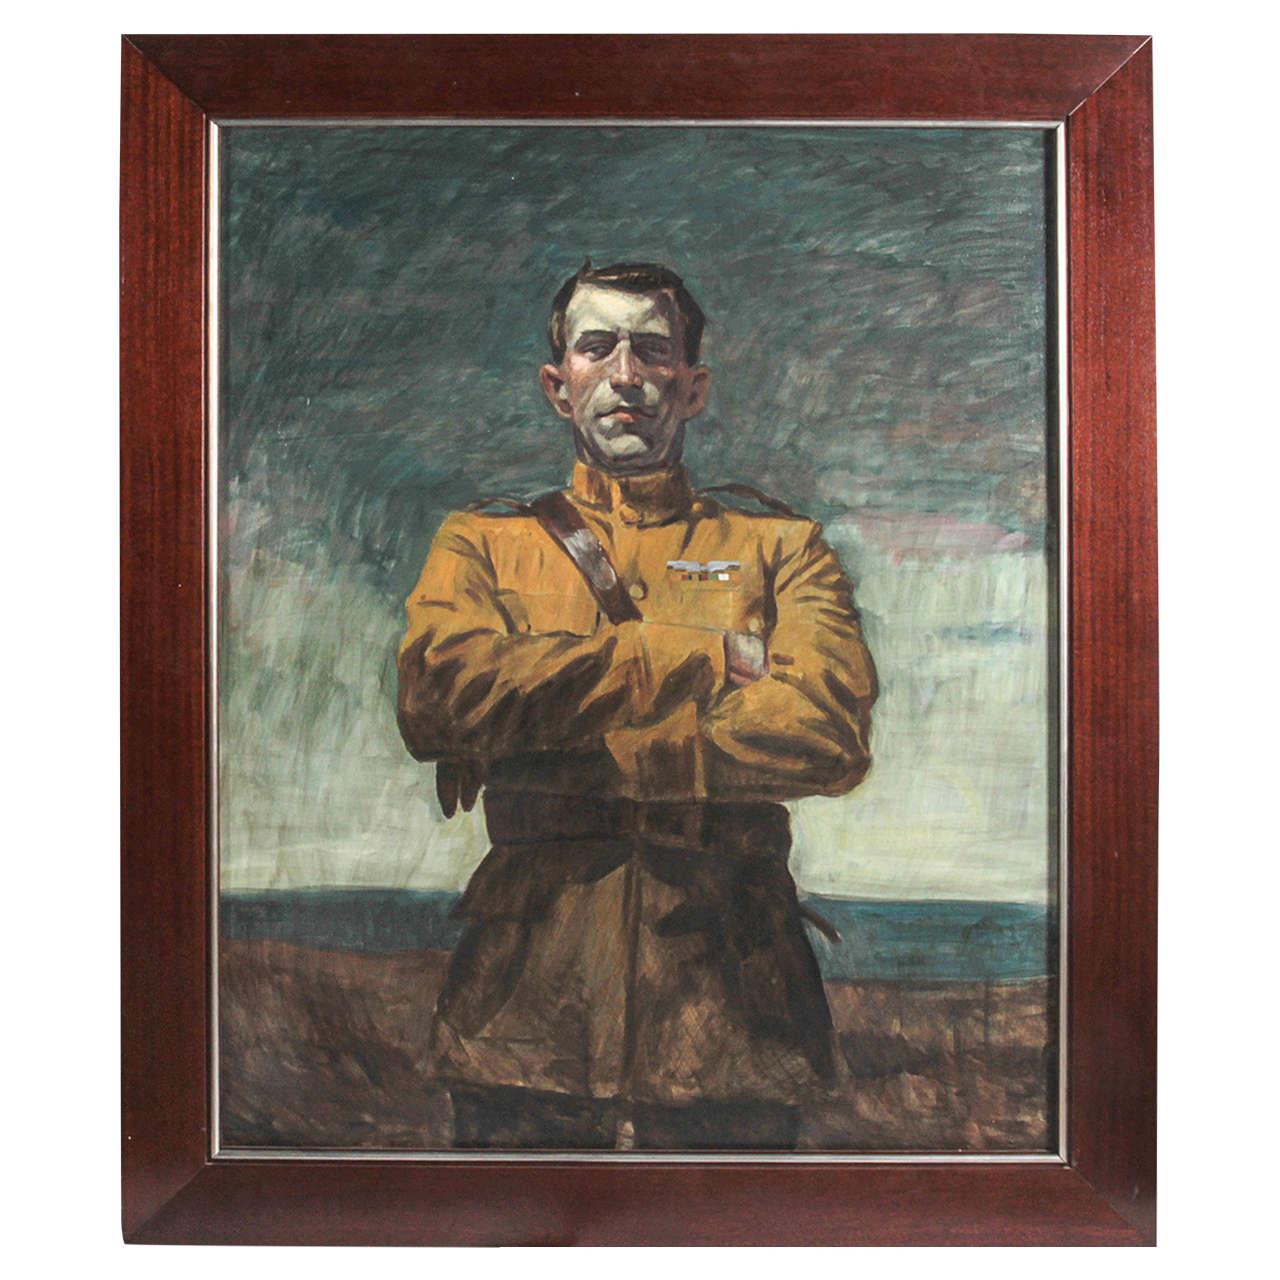 Untitled Man in Uniform by Mark Beard, Oil on Canvas